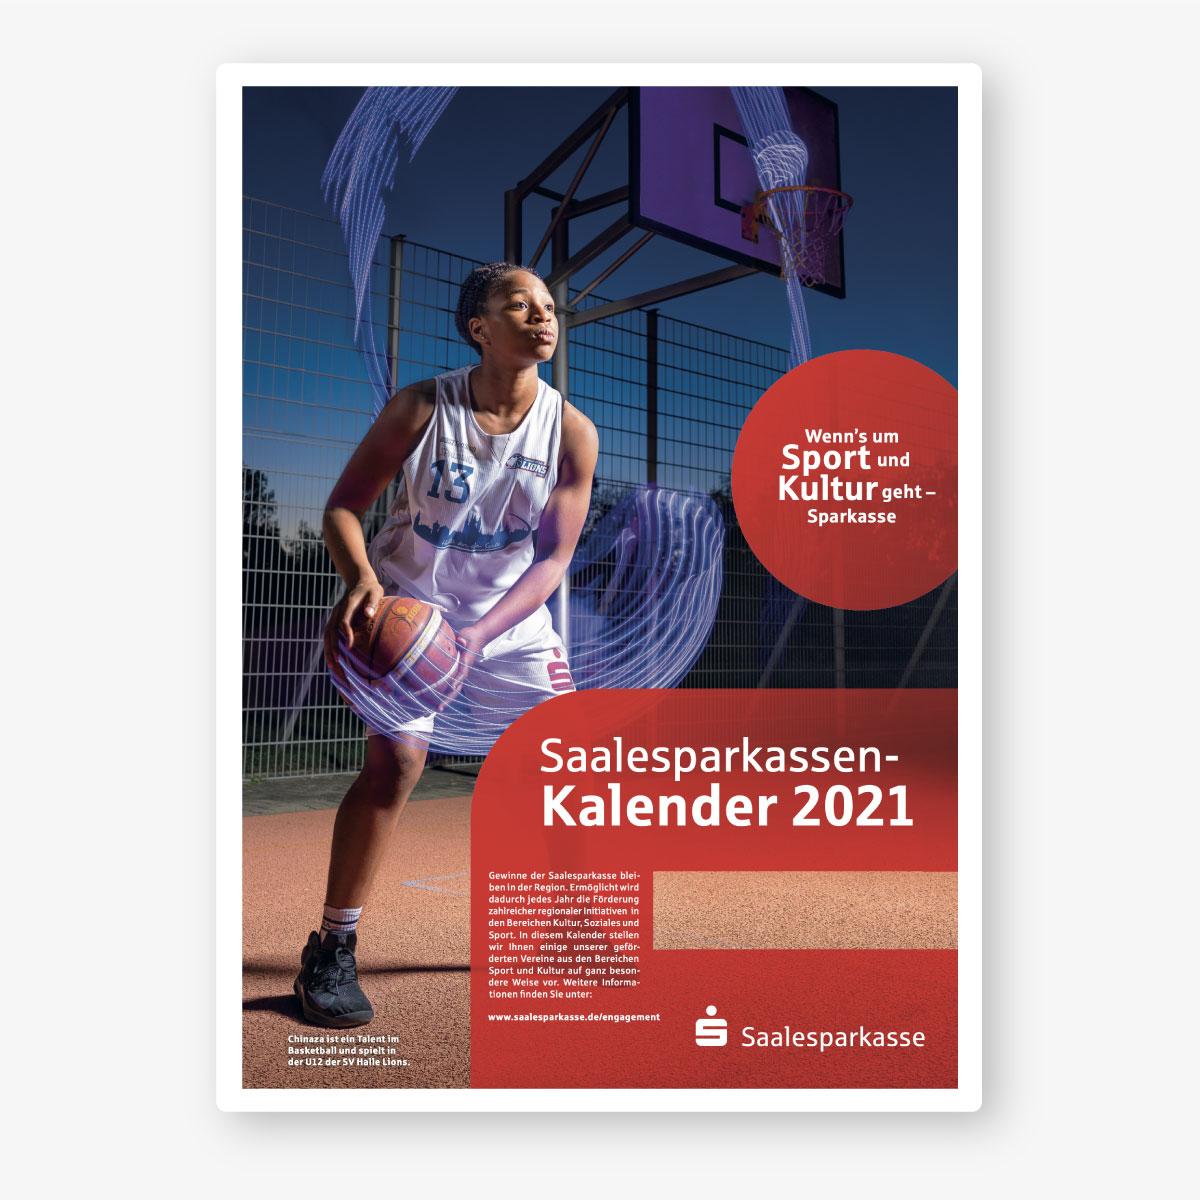 Saalesparkasse Kalender 2021: Titel